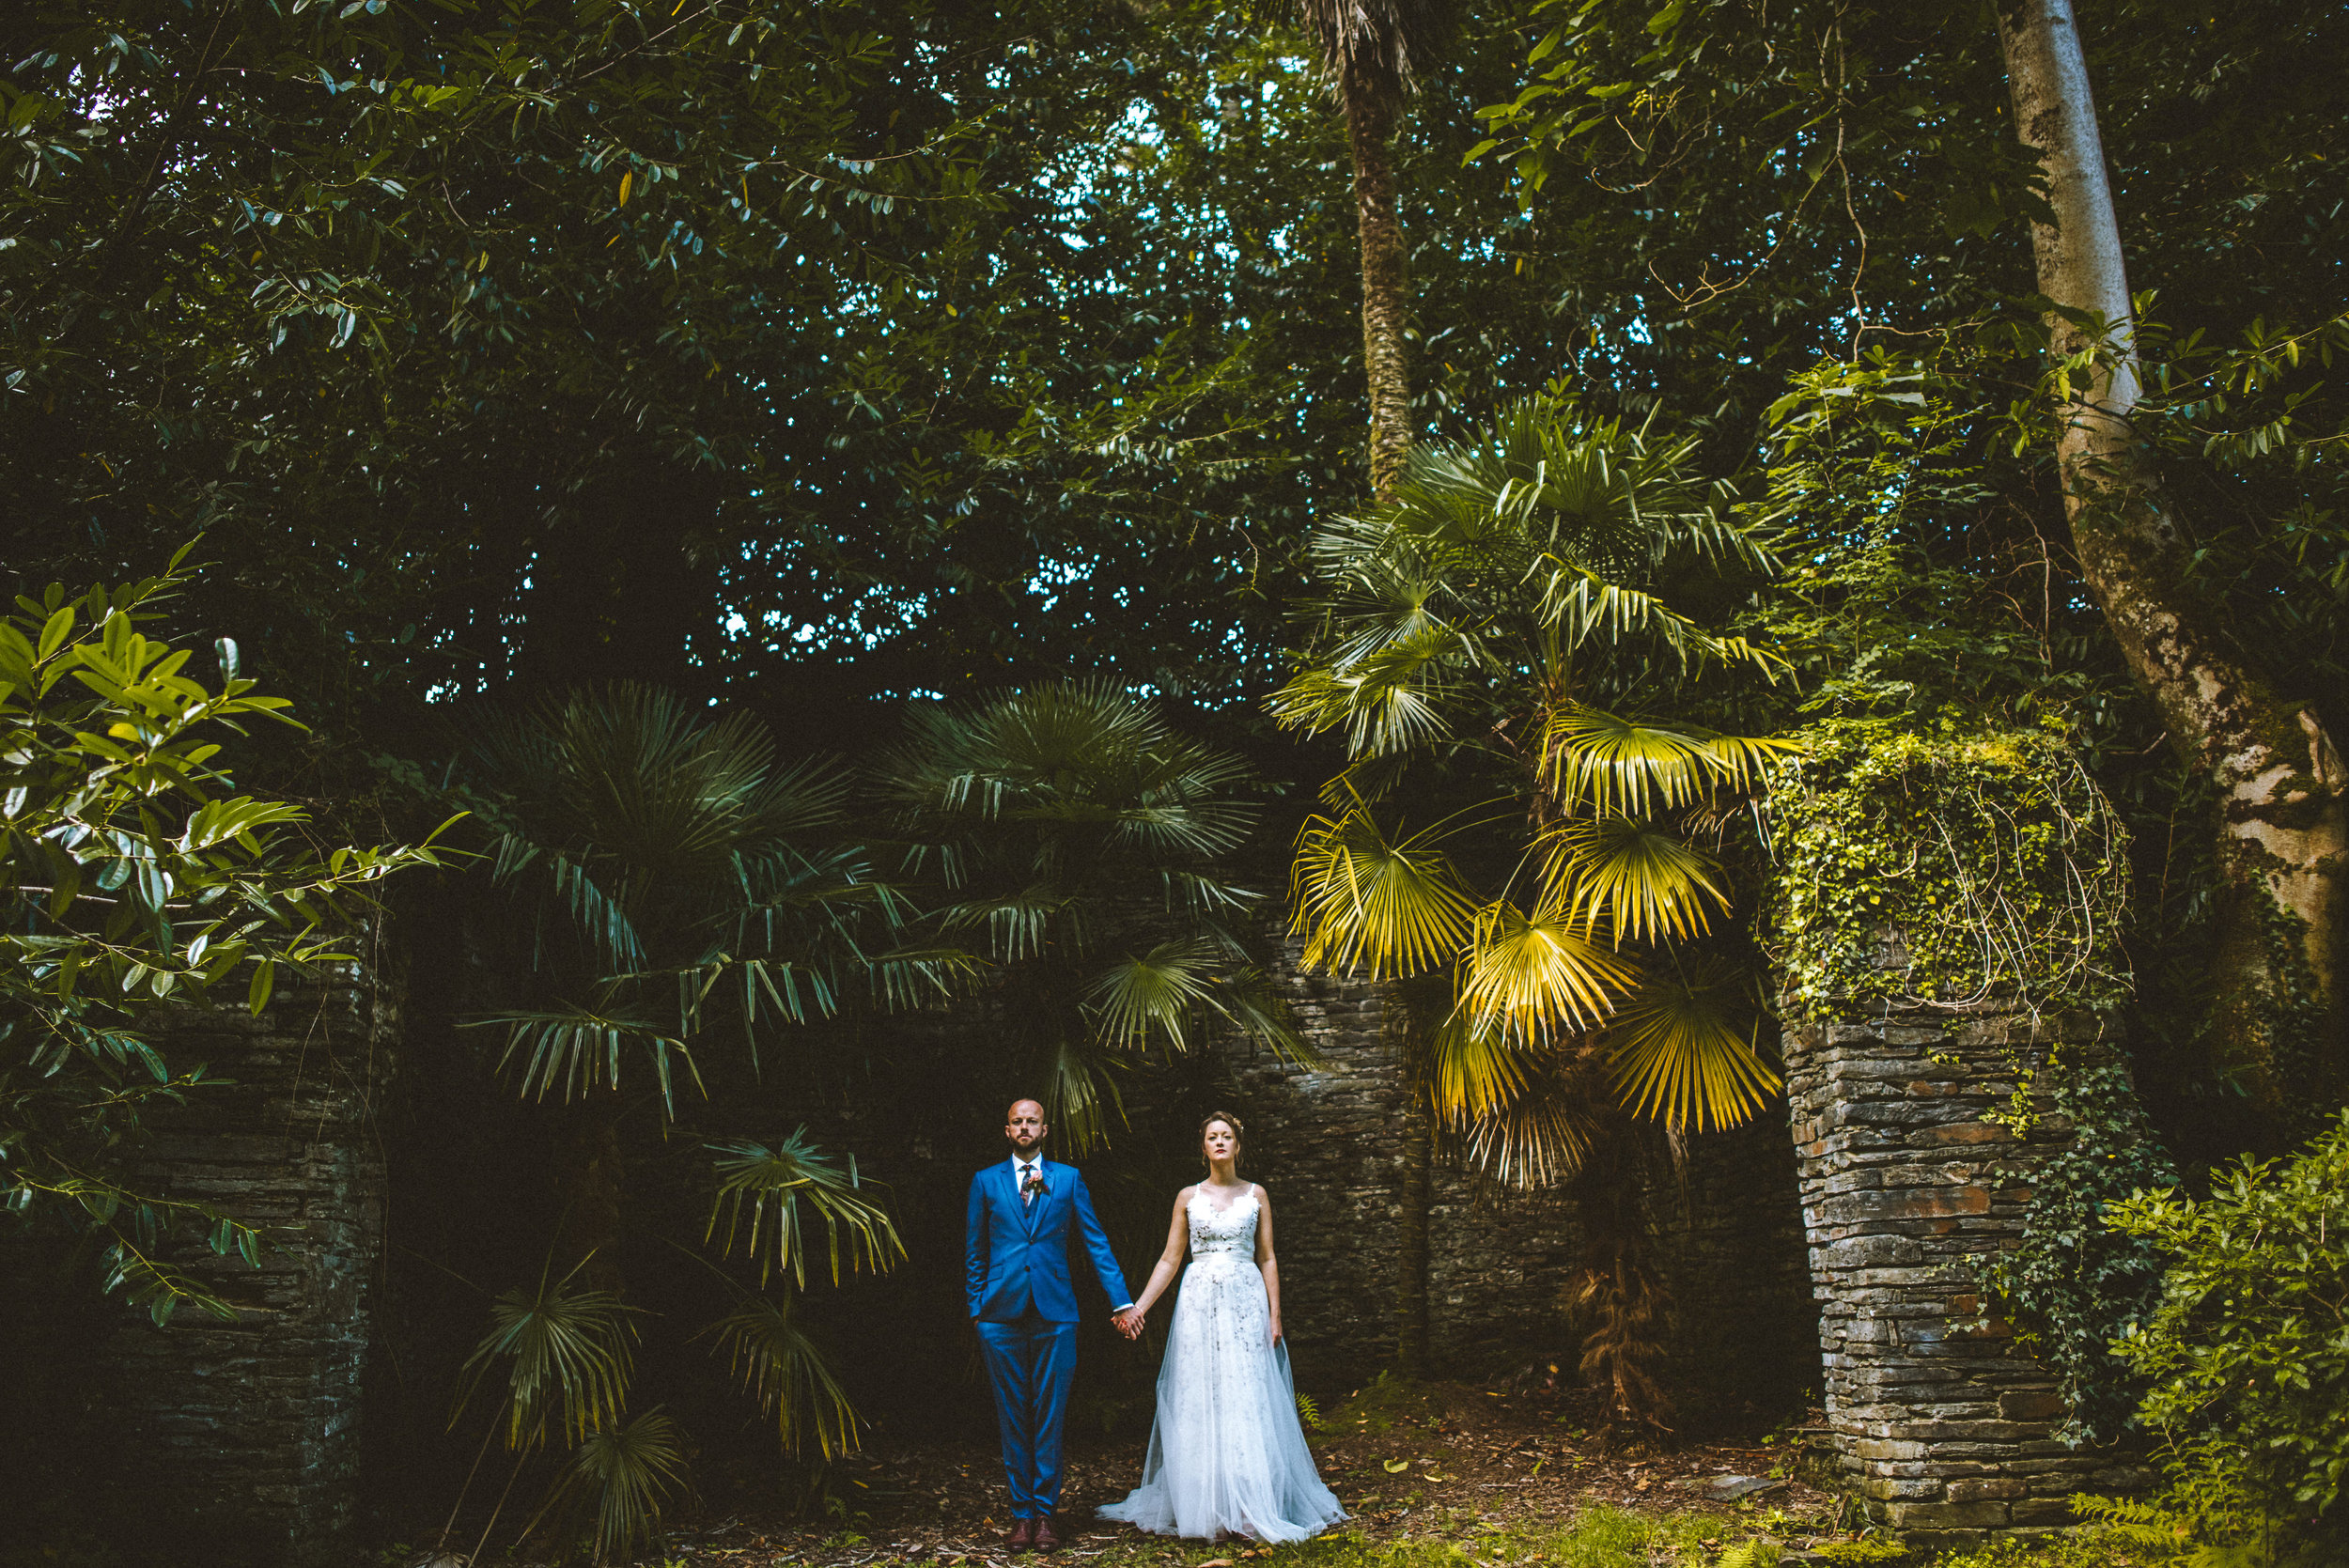 pencarrow-house-wedding-photographer-84.jpg